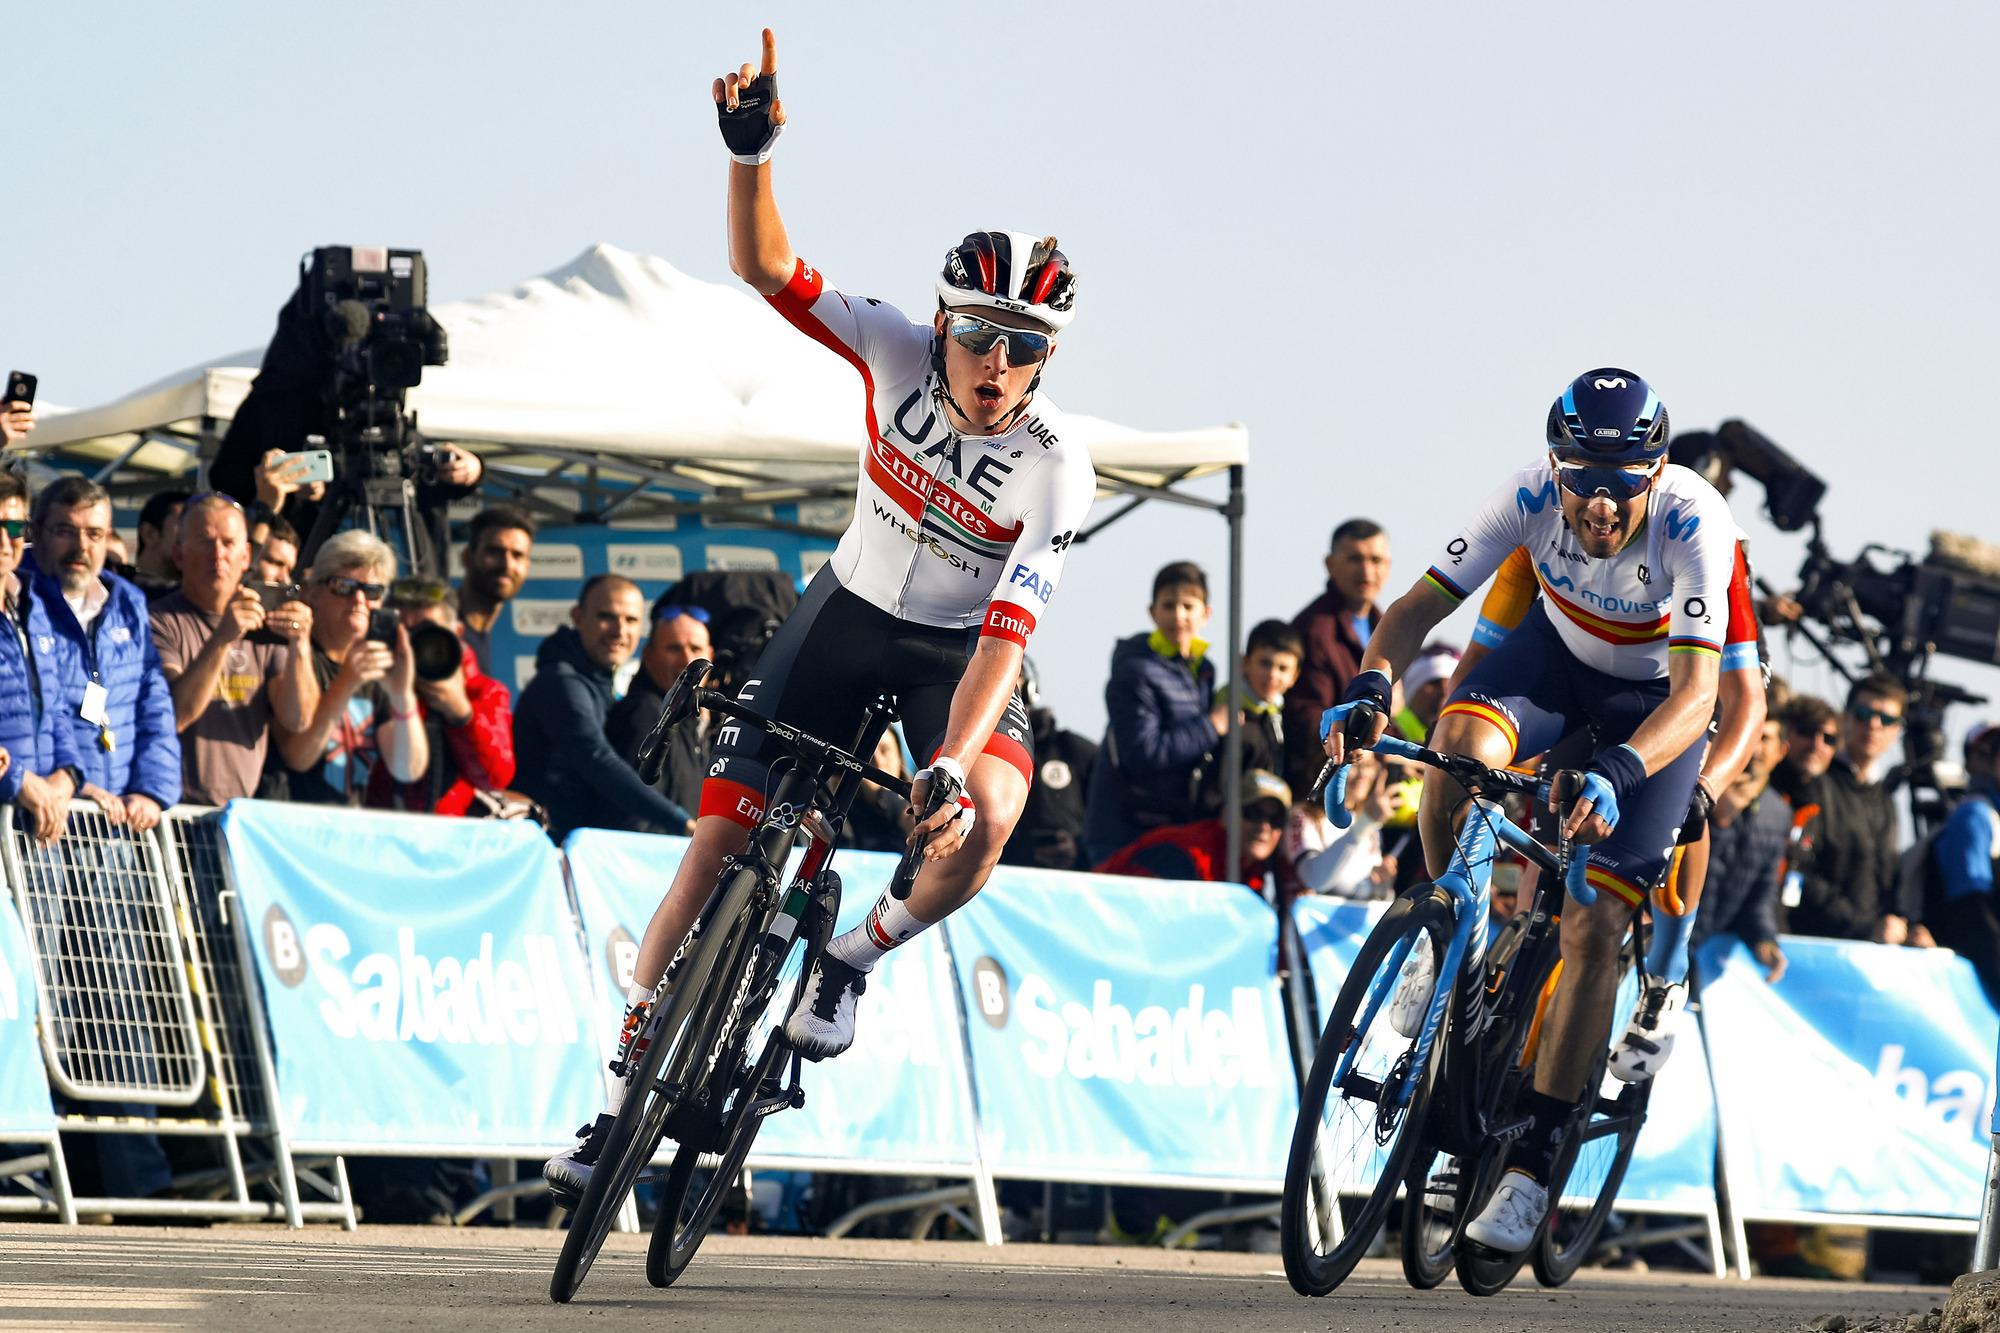 Volta a la Comunitat Valenciana 2020 - 71st Edition - 2nd stage Torrent - Cullera 181 km - 06/02/2020 - Tadej Pogacar (SLO - UAE - Team Emirates) - Alejandro Valverde (ESP - Movistar Team) - photo Luis Angel Gomez/BettiniPhoto©2020